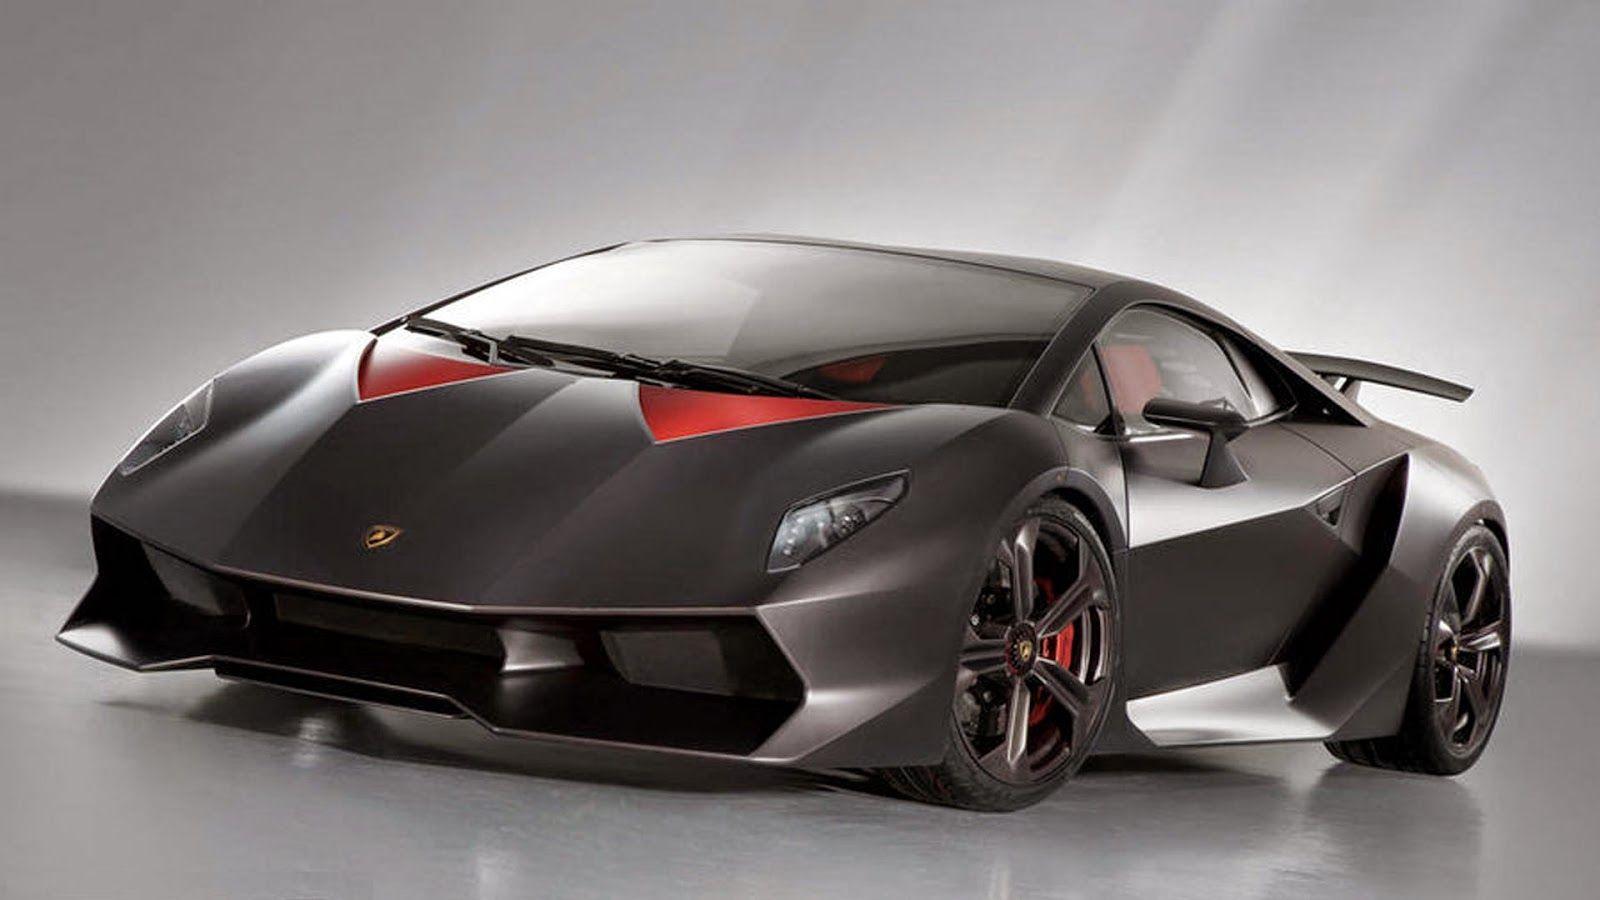 Free Download Lamborghini Sesto Elemento Wallpaper Lamborghinis